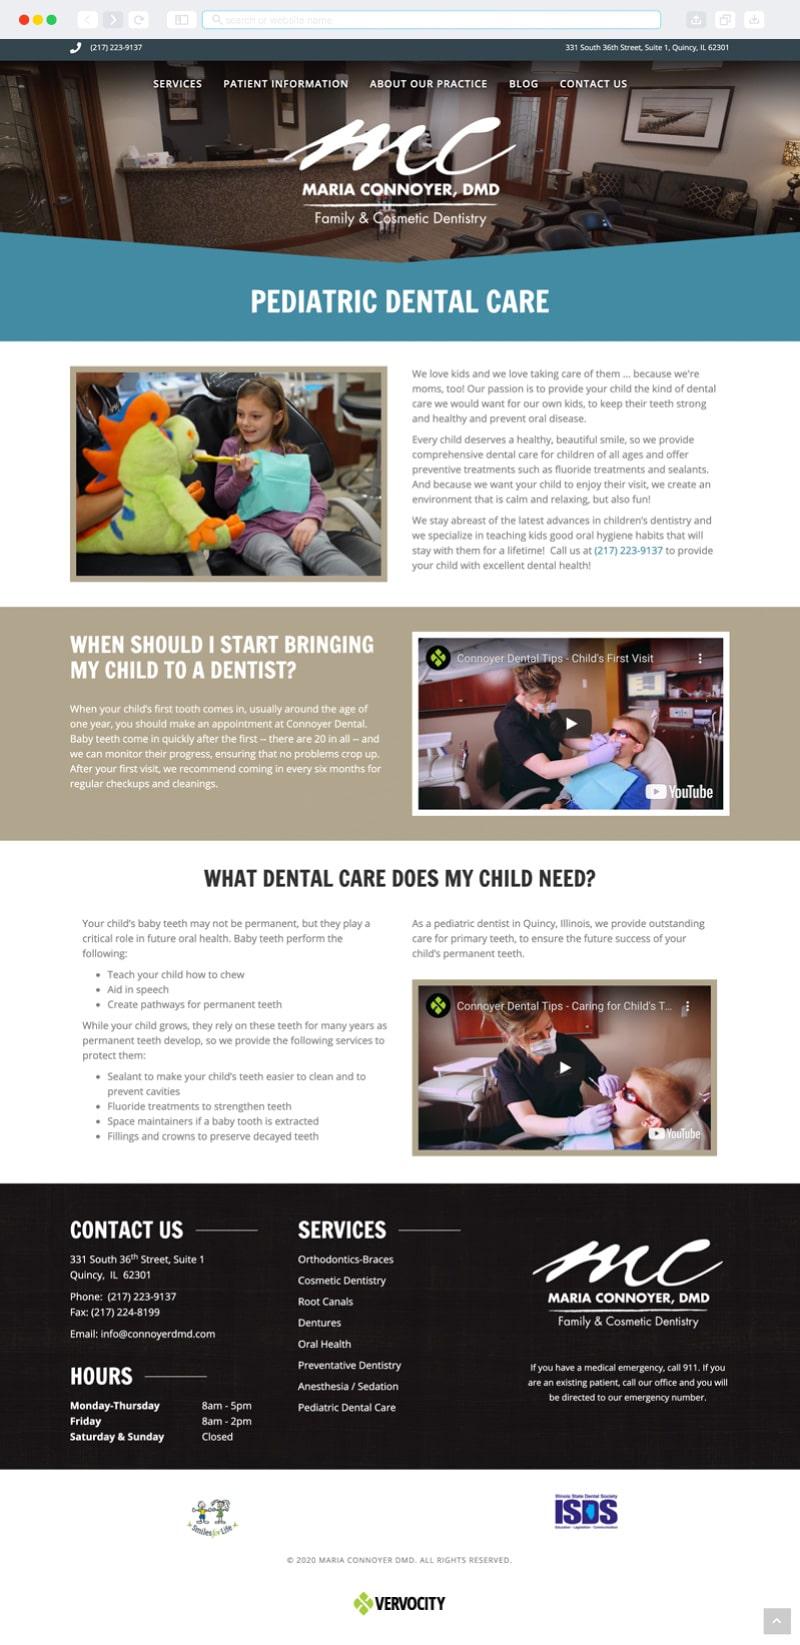 Connoyer Dental Interior Page | Vervocity